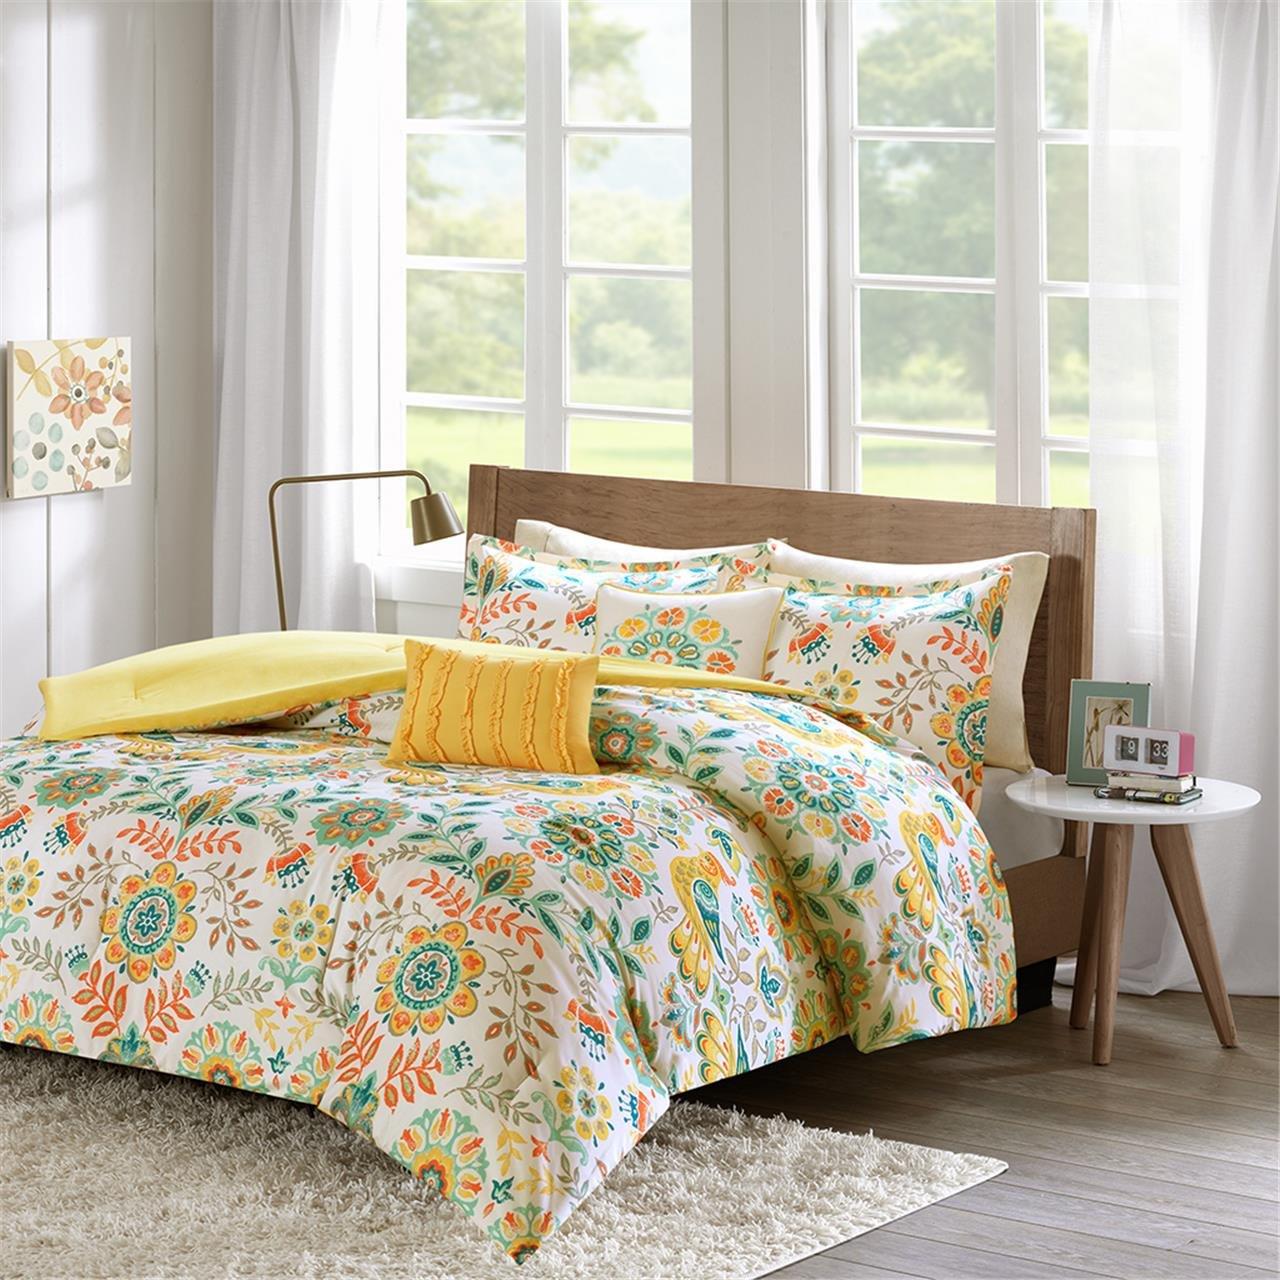 Intelligent Design Nina Comforter Set Twin/Twin XL Size - Orange, Medallion – 4 Piece Bed Sets – Ultra Soft Microfiber Teen Bedding for Girls Bedroom